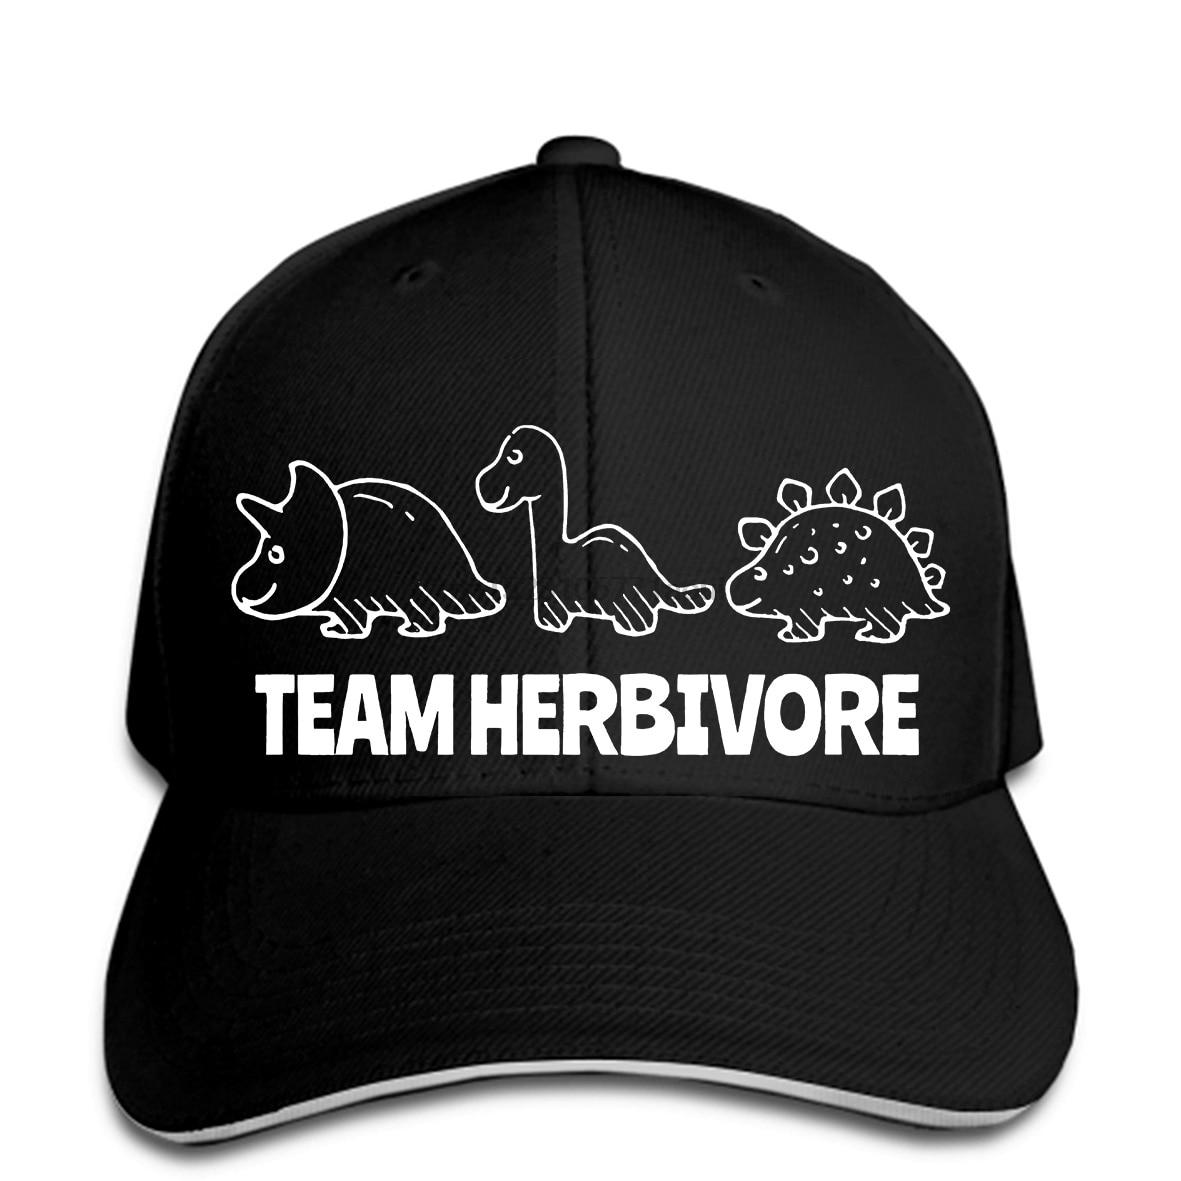 Baseball cap TEAM HERBIVORE Print hat EAT FRUIT EARTH ANIMAL LOVER VEGAN VIBES FASHION SWAG DOP